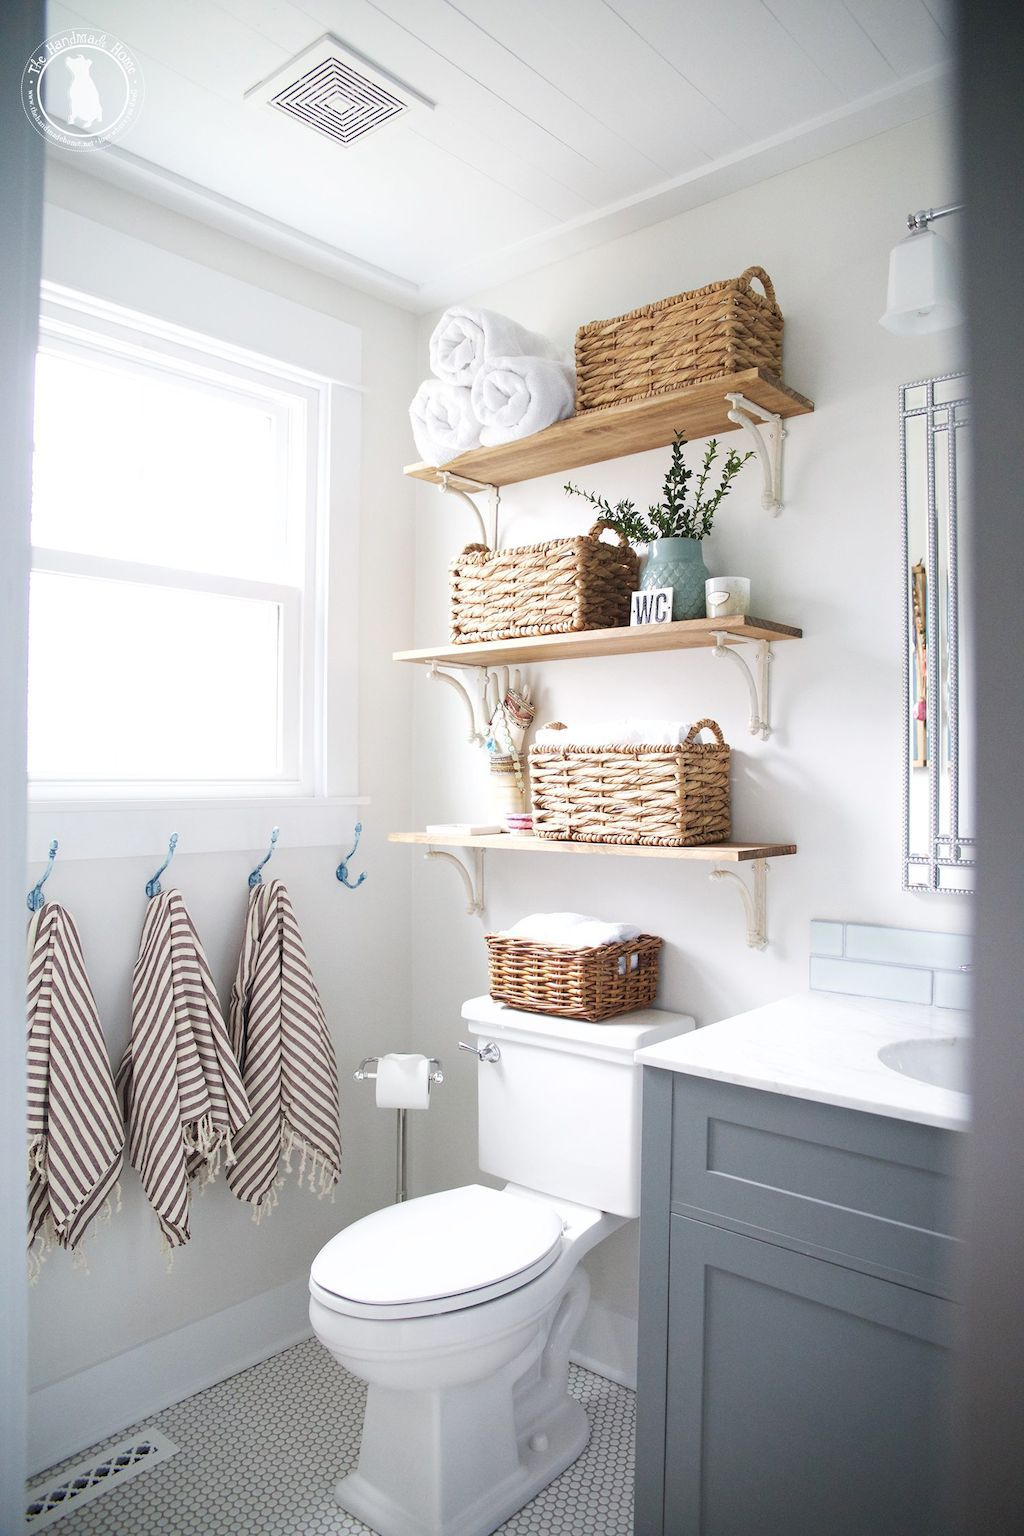 SMALL MASTER BATHROOM REMODEL IDEAS - Decor Units on Small Bathroom Remodel Ideas  id=23177